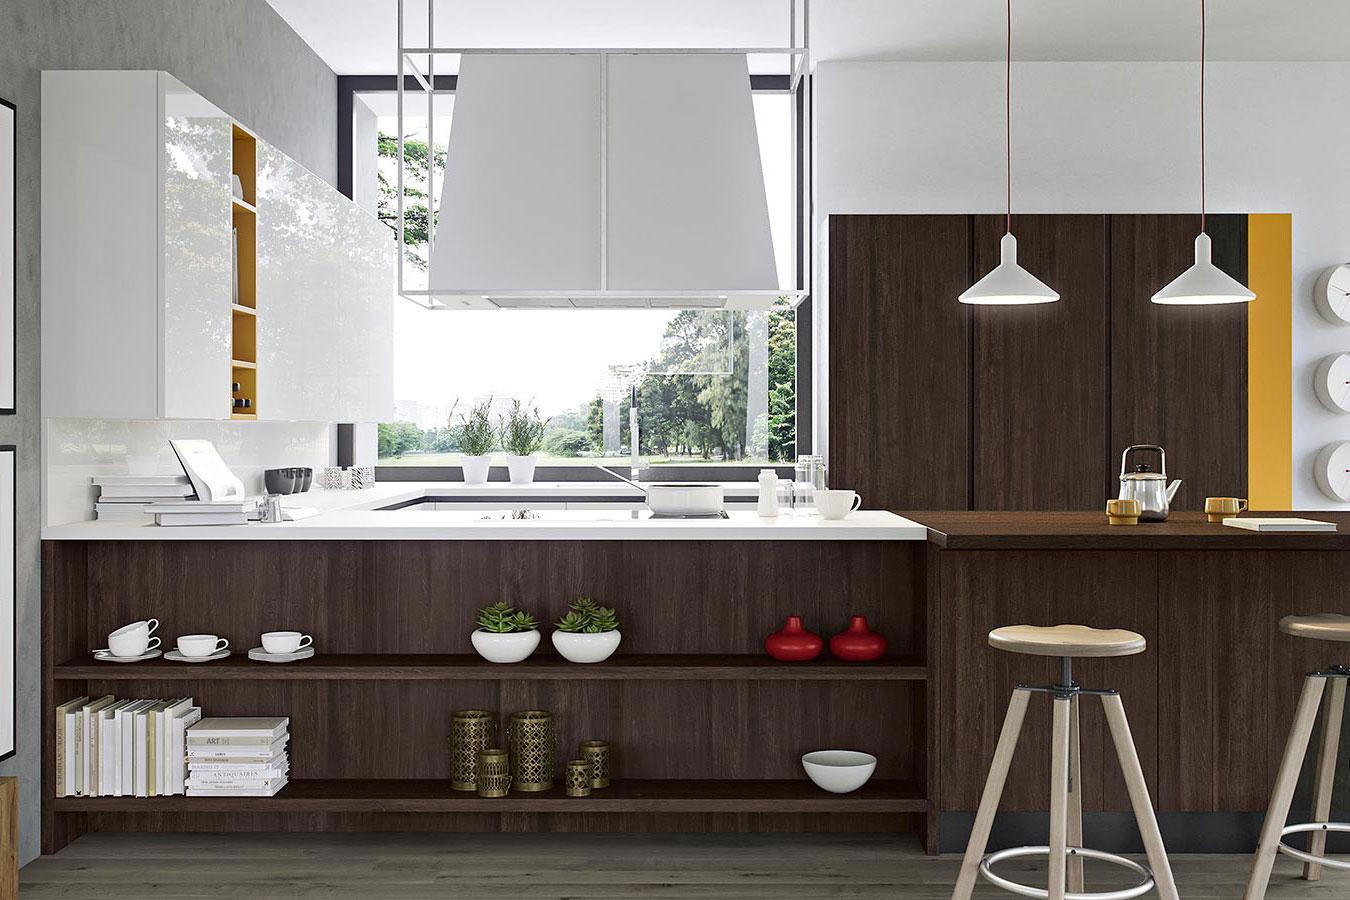 Cucina kal di arredo3 righetti mobili novara for Mobili novara